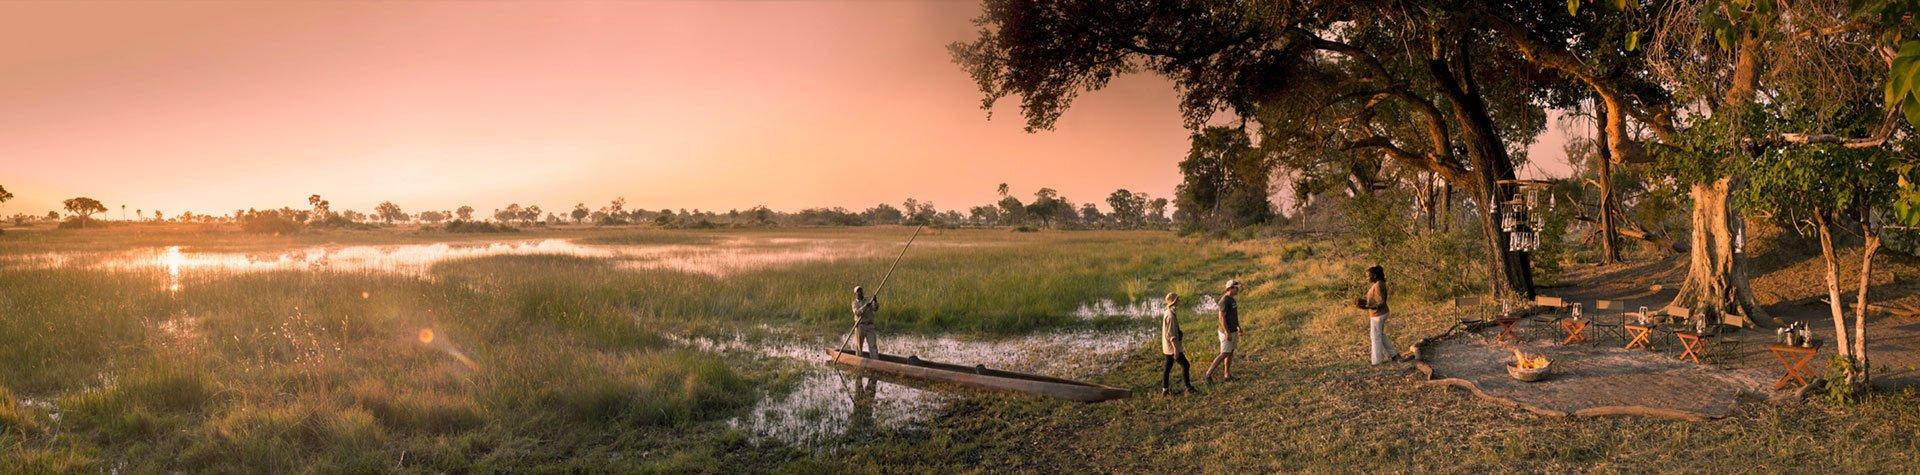 Botswana photo expedition copyright AndBeyond travel